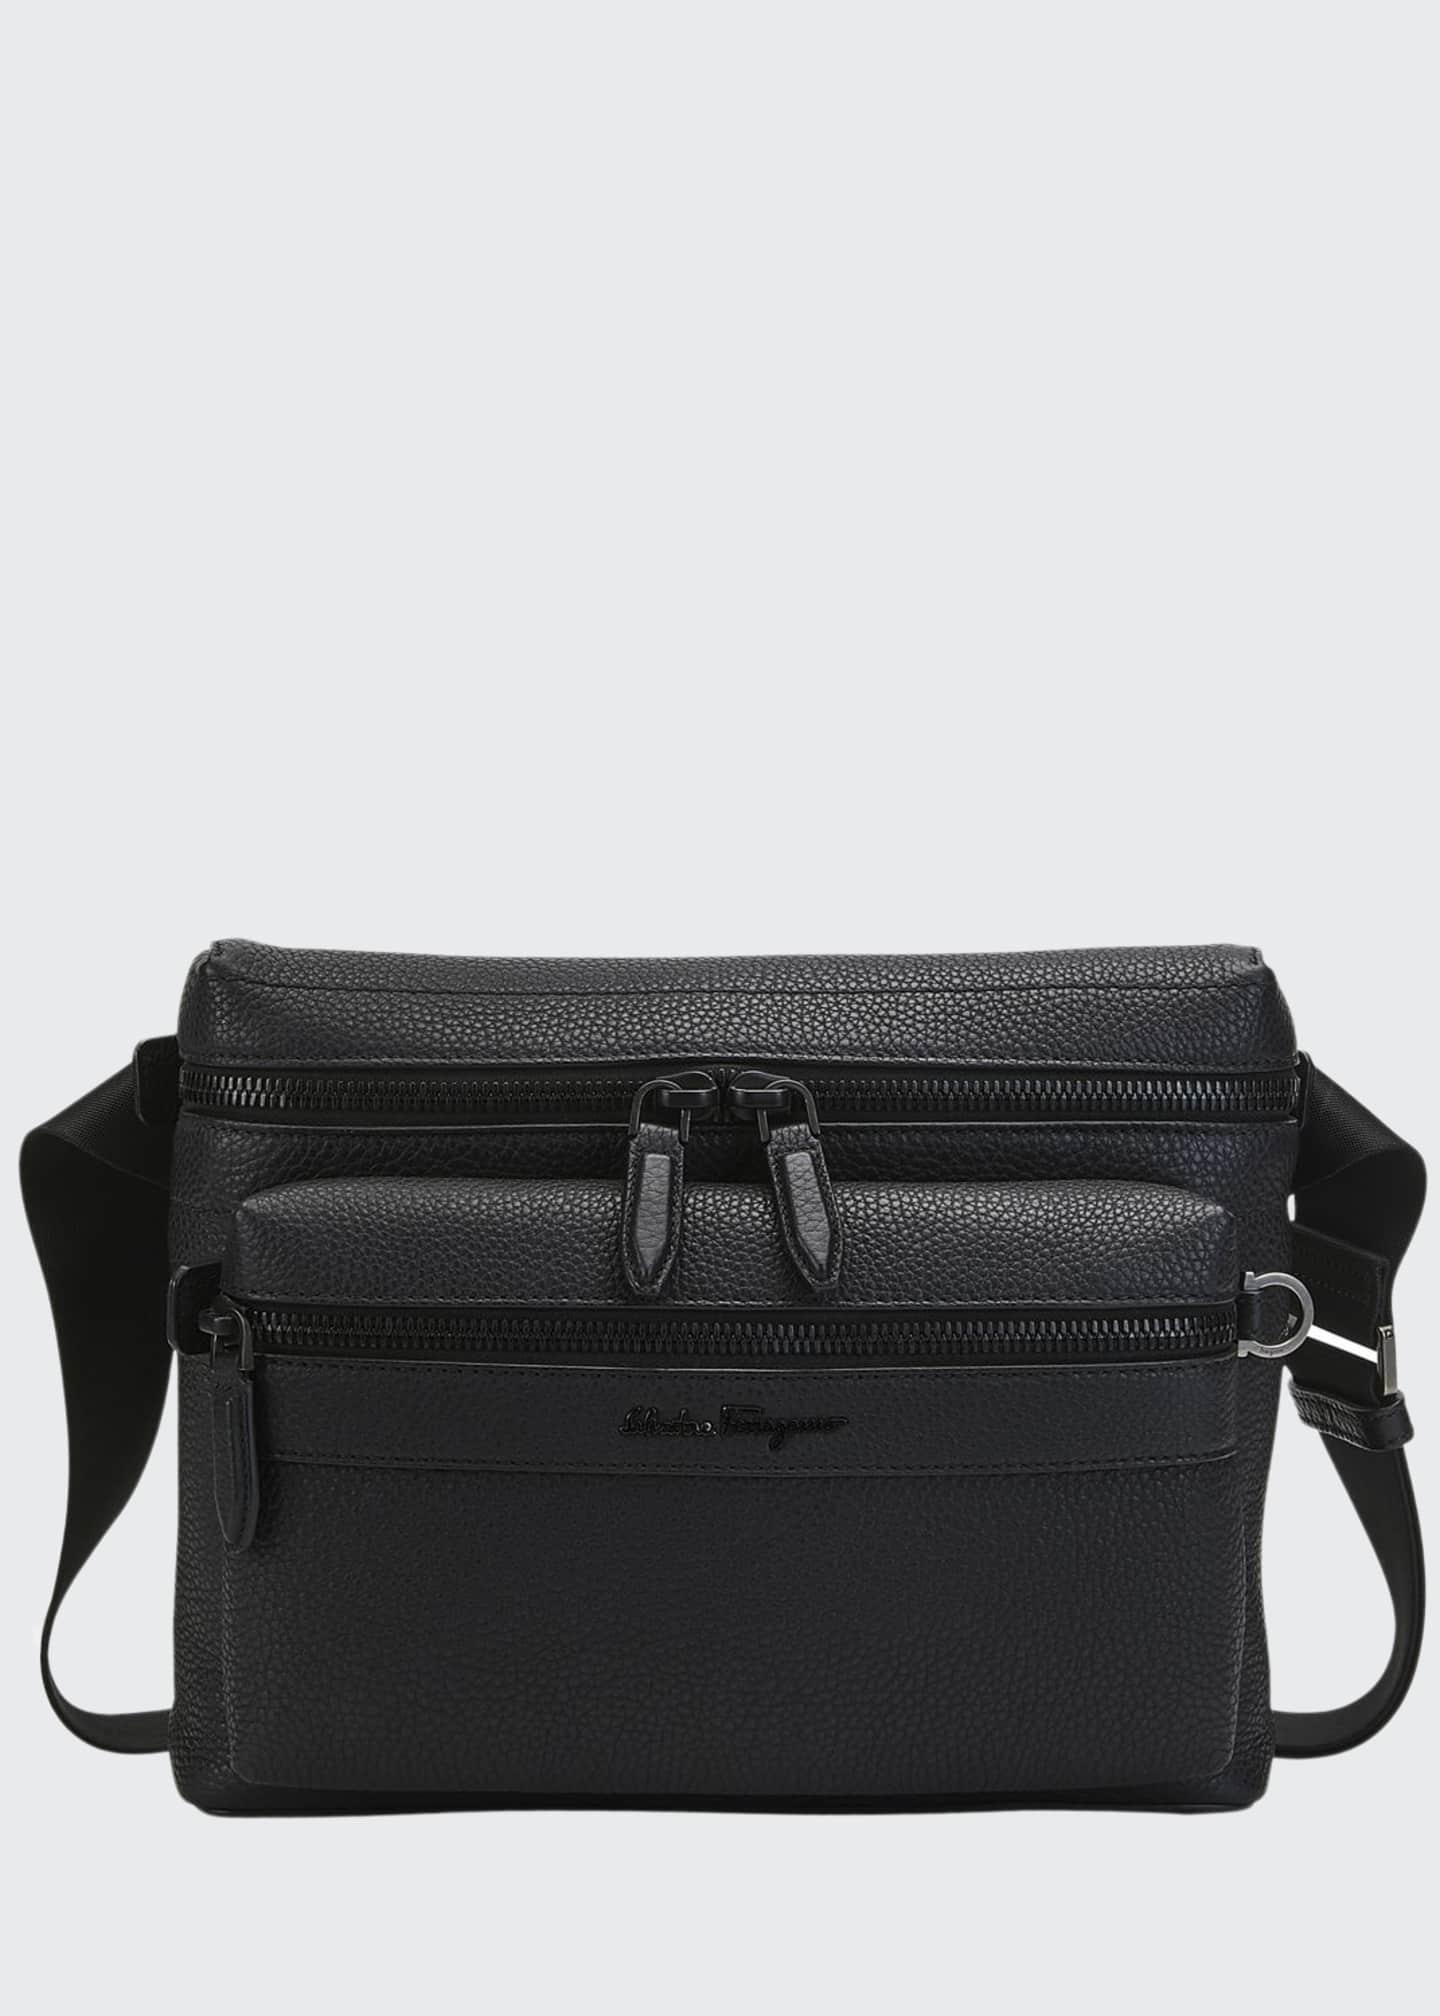 Salvatore Ferragamo Men's Tonal Leather Crossbody Bag